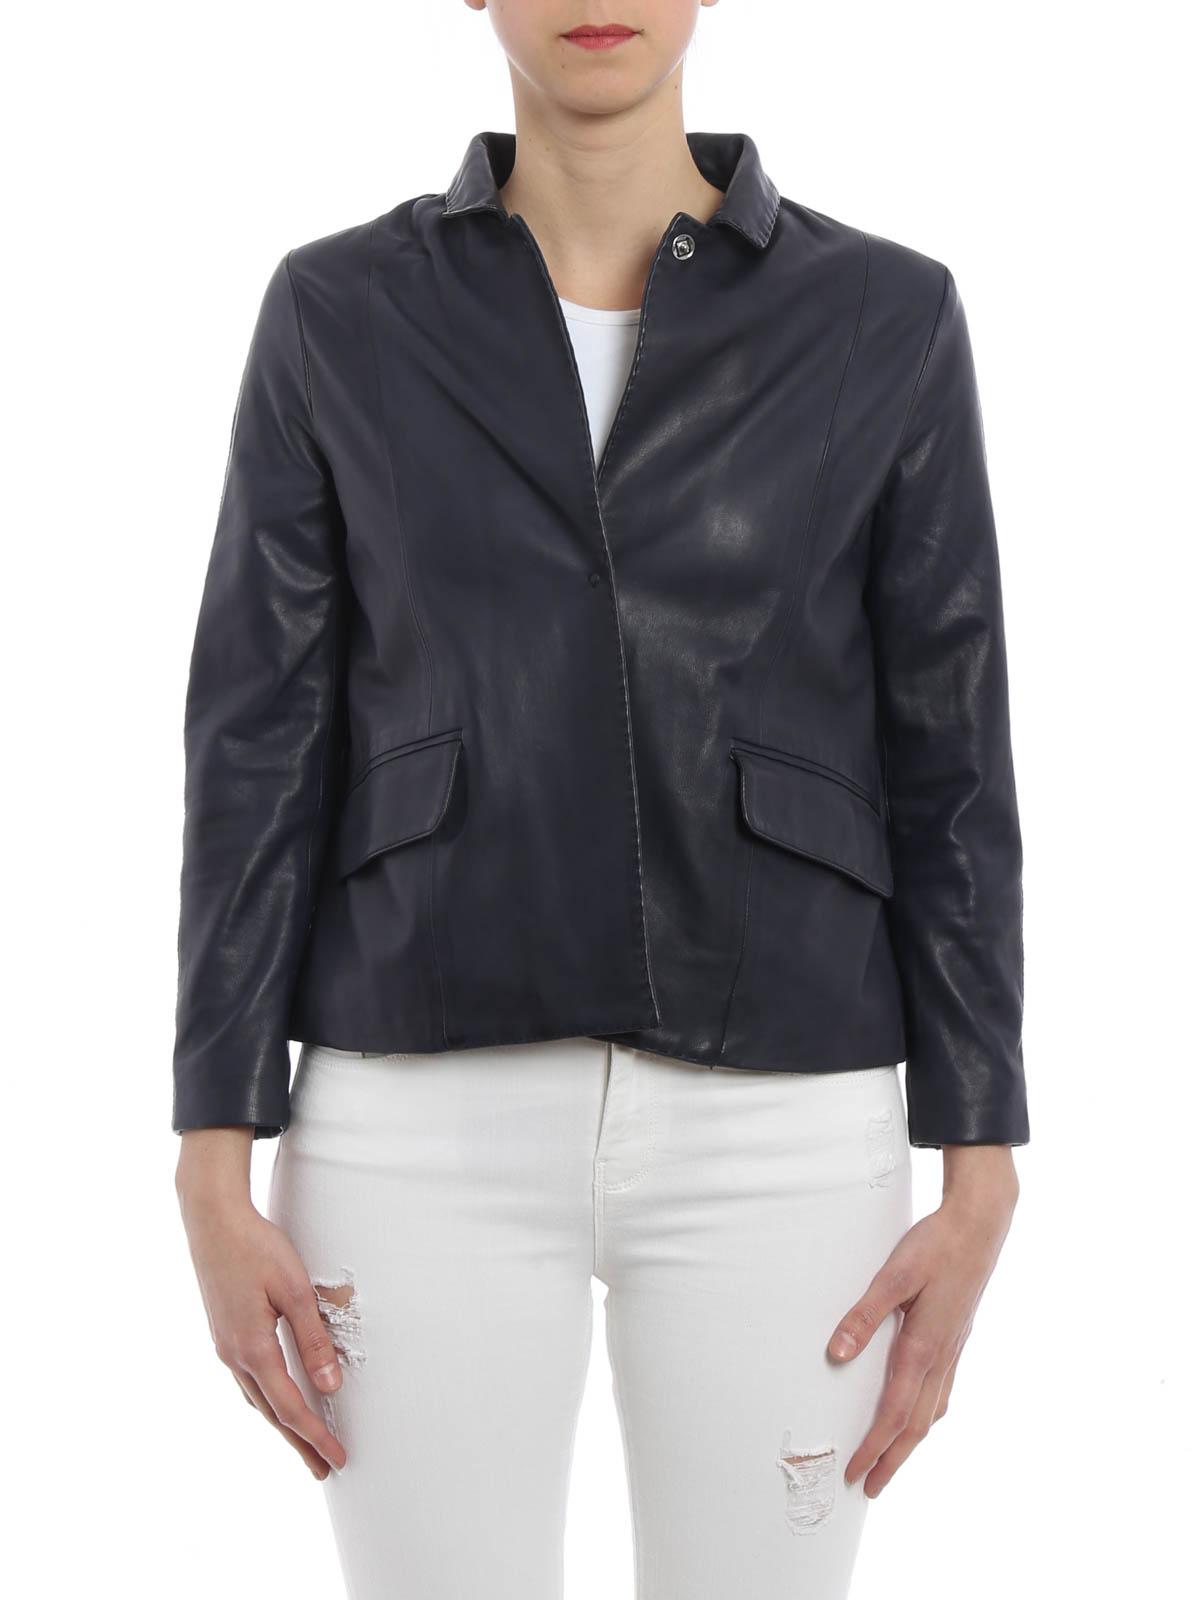 00a80fdc732a S.W.O.R.D 6.6.44 - Cropped napa jacket - leather jacket - 9145 IMPACT